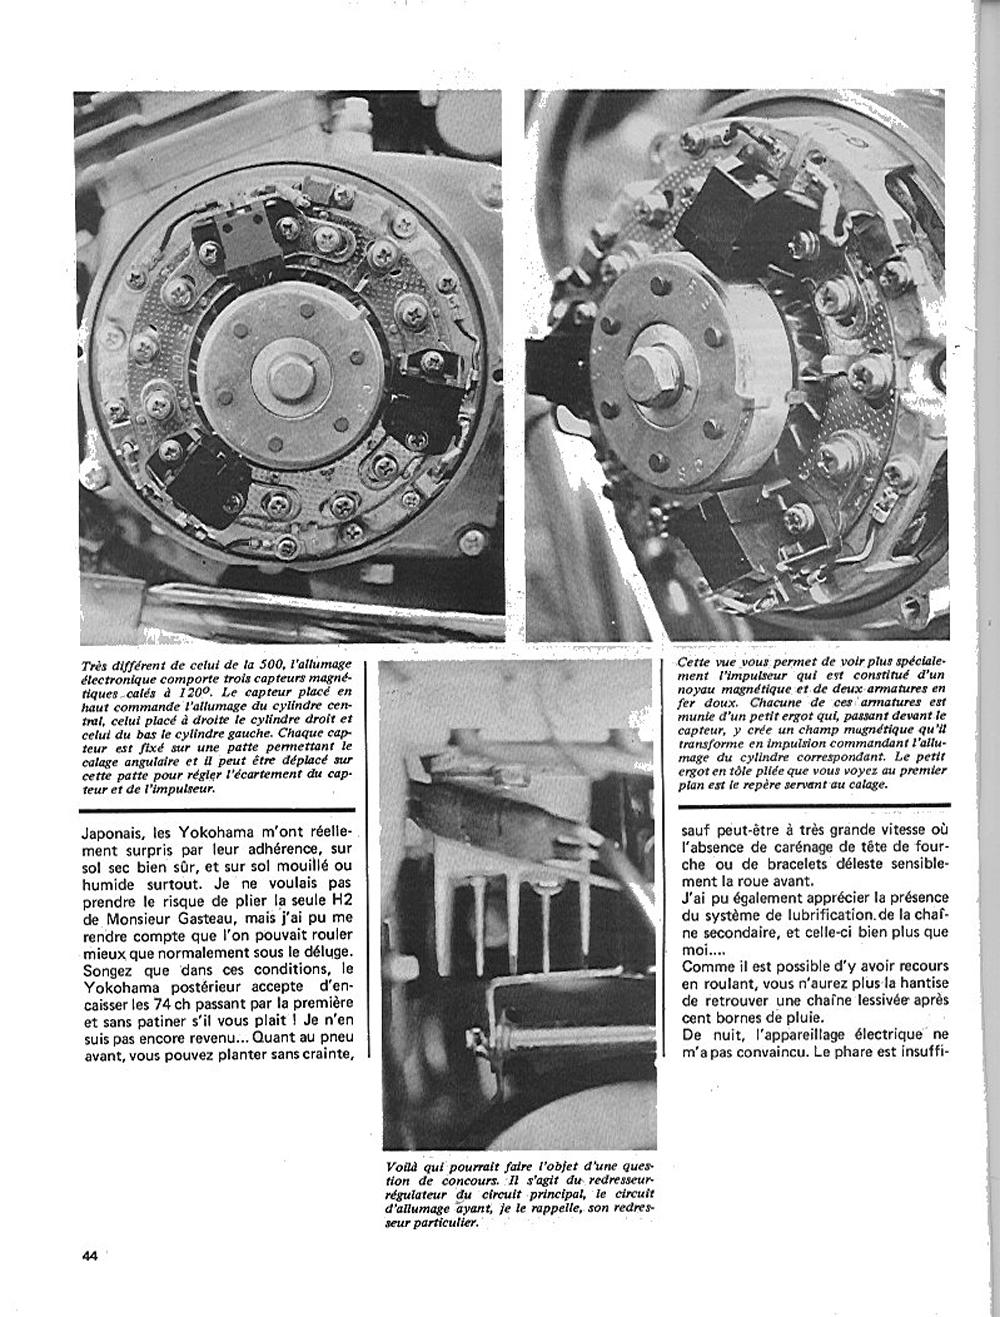 1972 Kawasaki H2 750 road test france 09.jpg